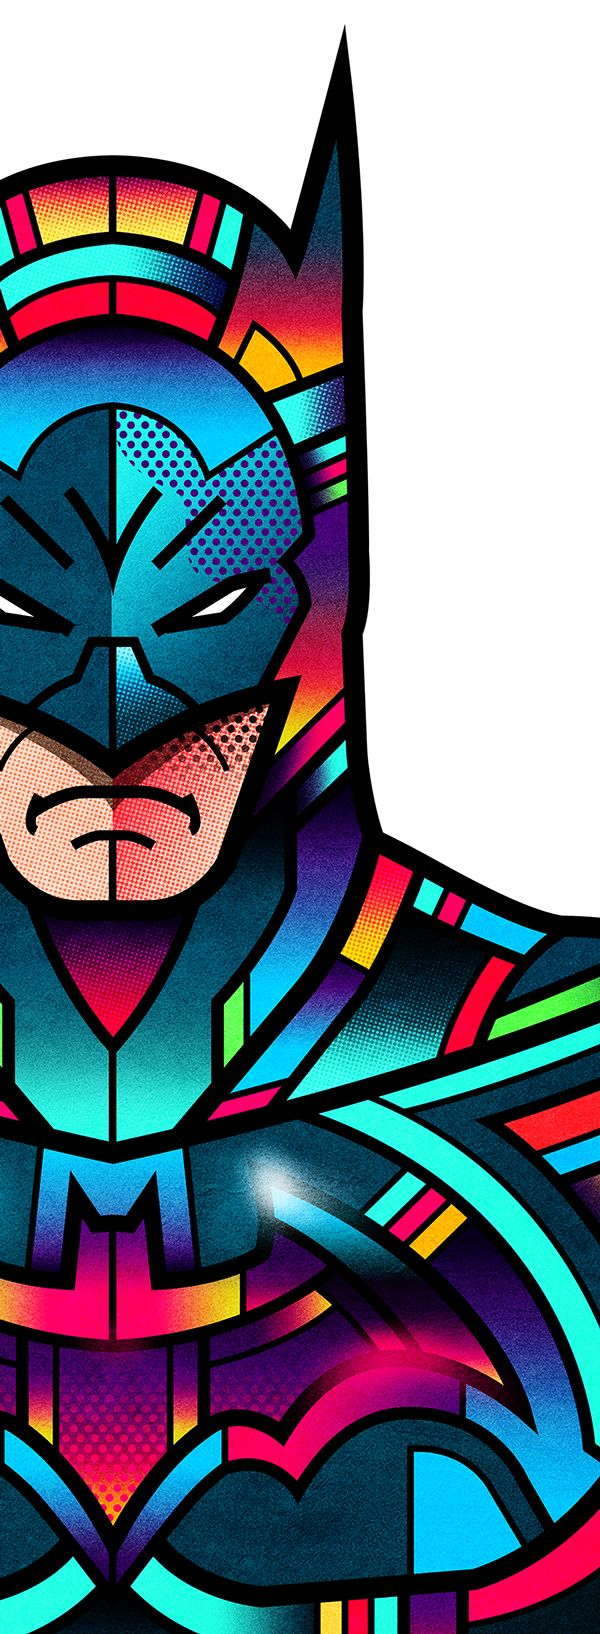 Plateia.co #ValoralaDiversidad #CreatividadsinLimites #PlateiaColombia #comics SUPERHEROES EXCLUSIVE COLLECTION :: WONDERCON 2015 FOR HERO COMPLEX GALLERY